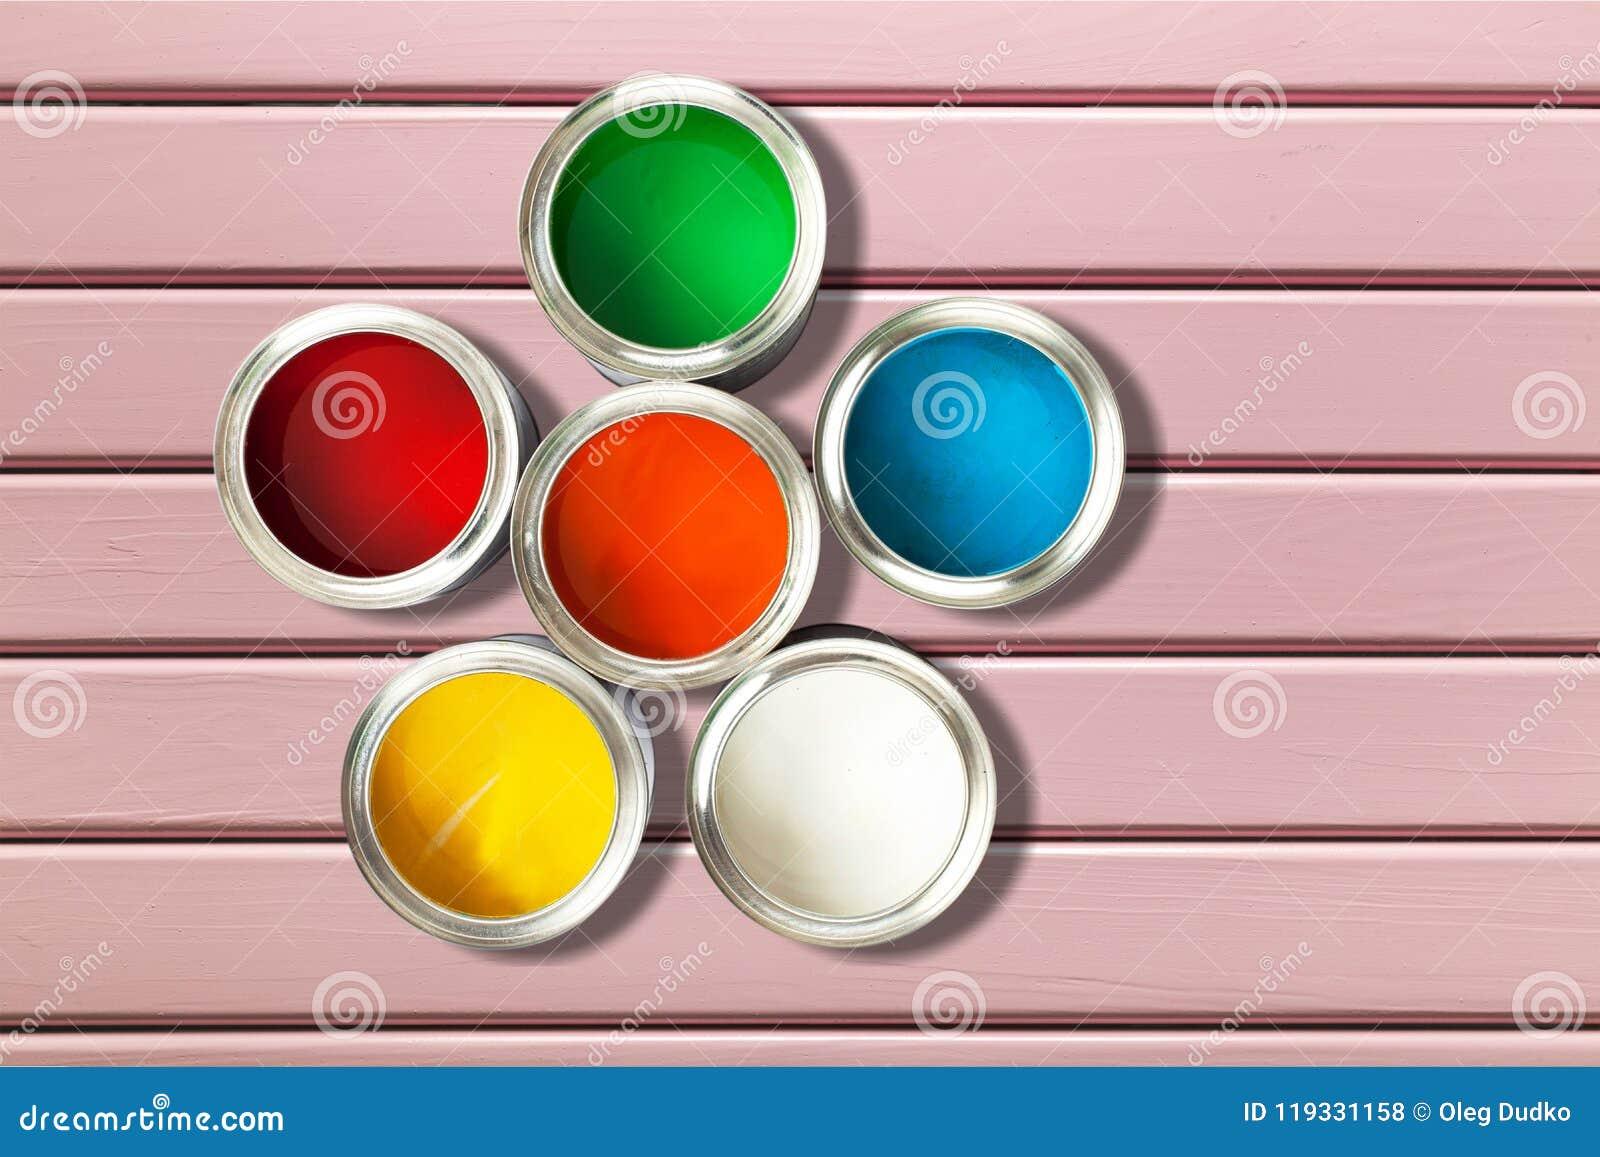 Color Wheel Stock Photo Image Of Descriptive Blue 119331158